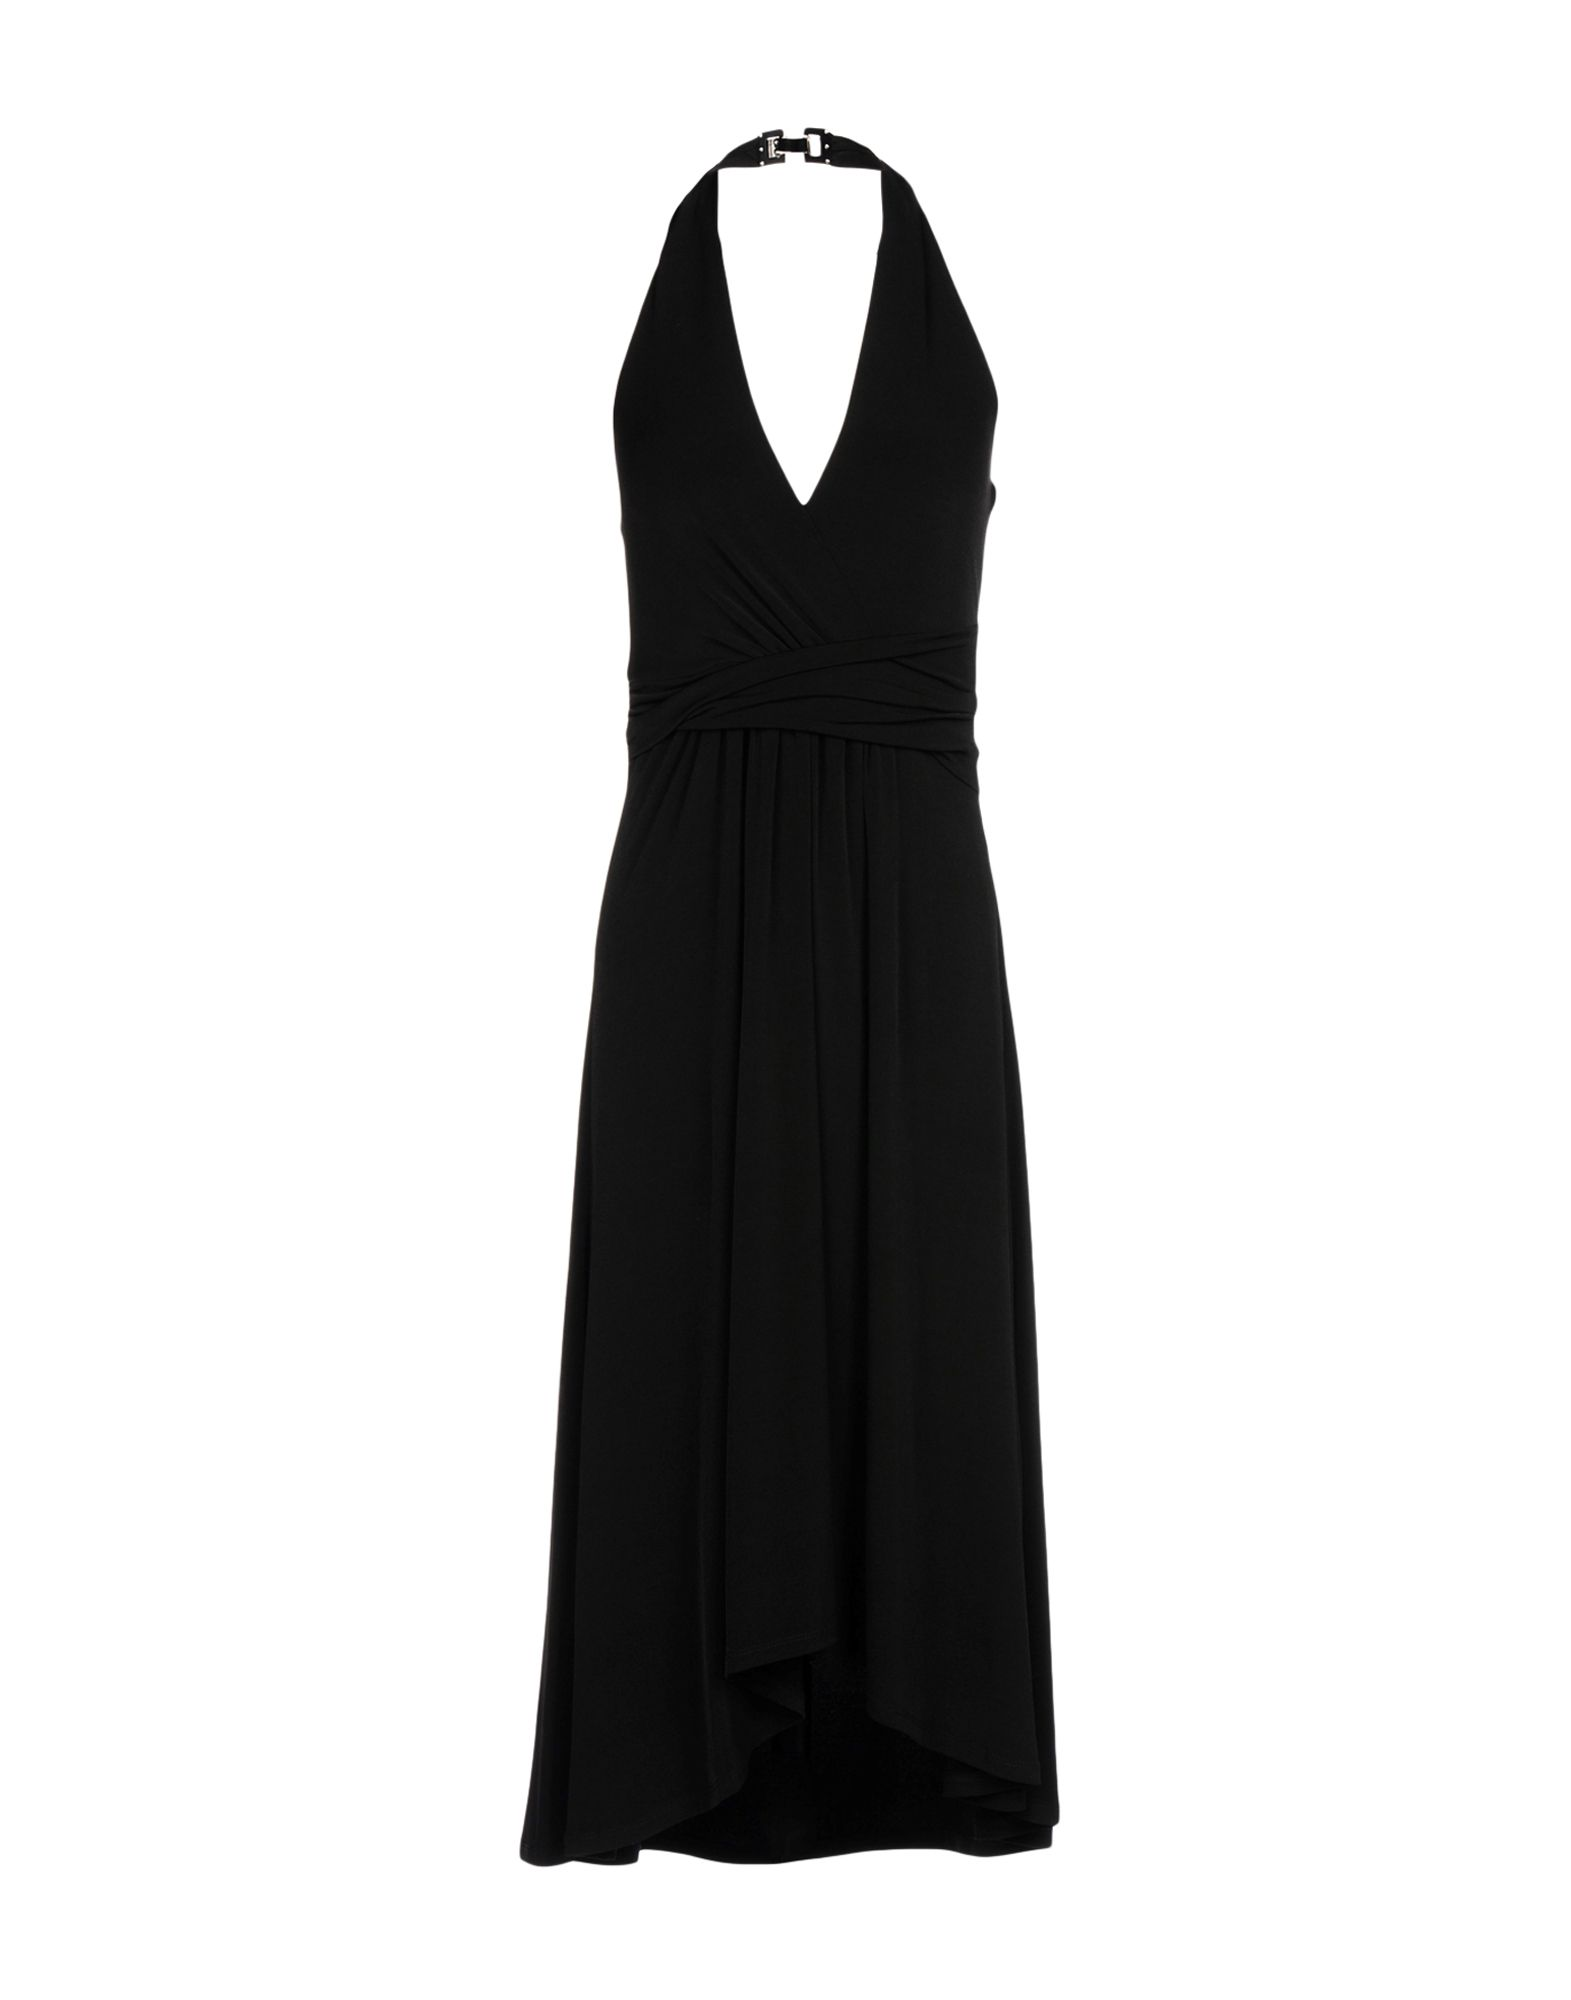 Micheal kors black dress1